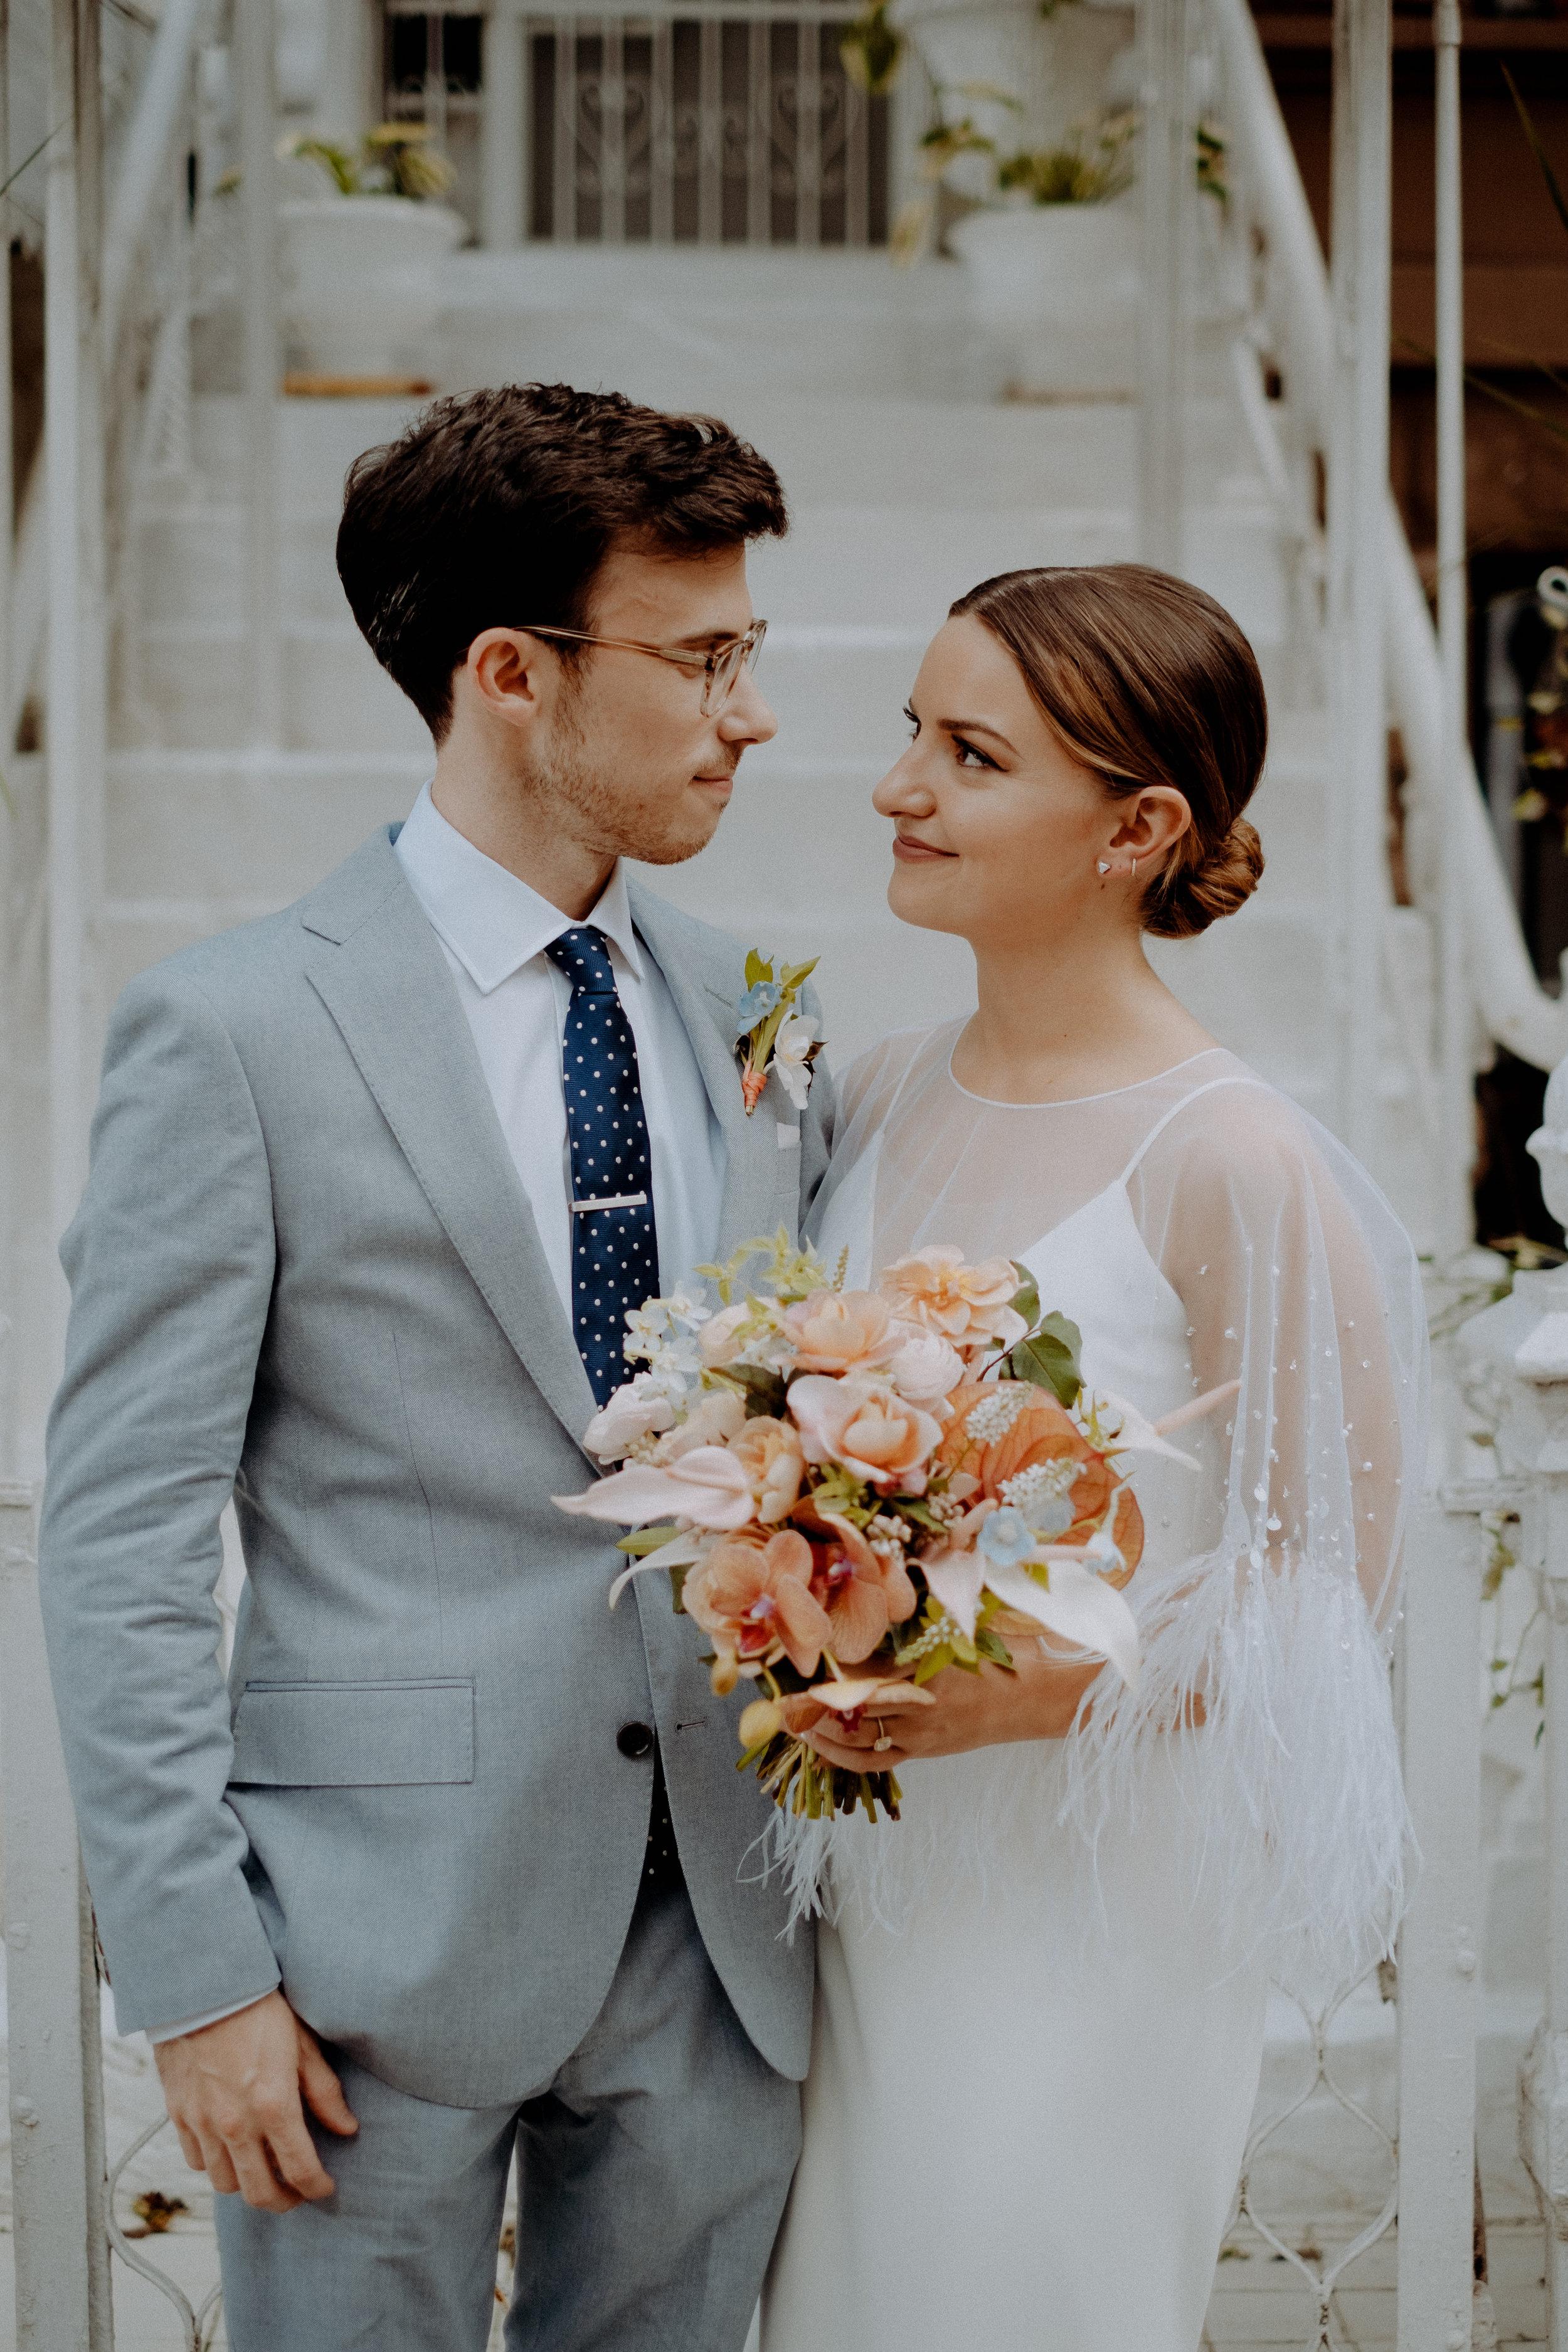 Chellise_Michael_Photography_Robertas_Brooklyn_Wedding_Photographer-251.jpg